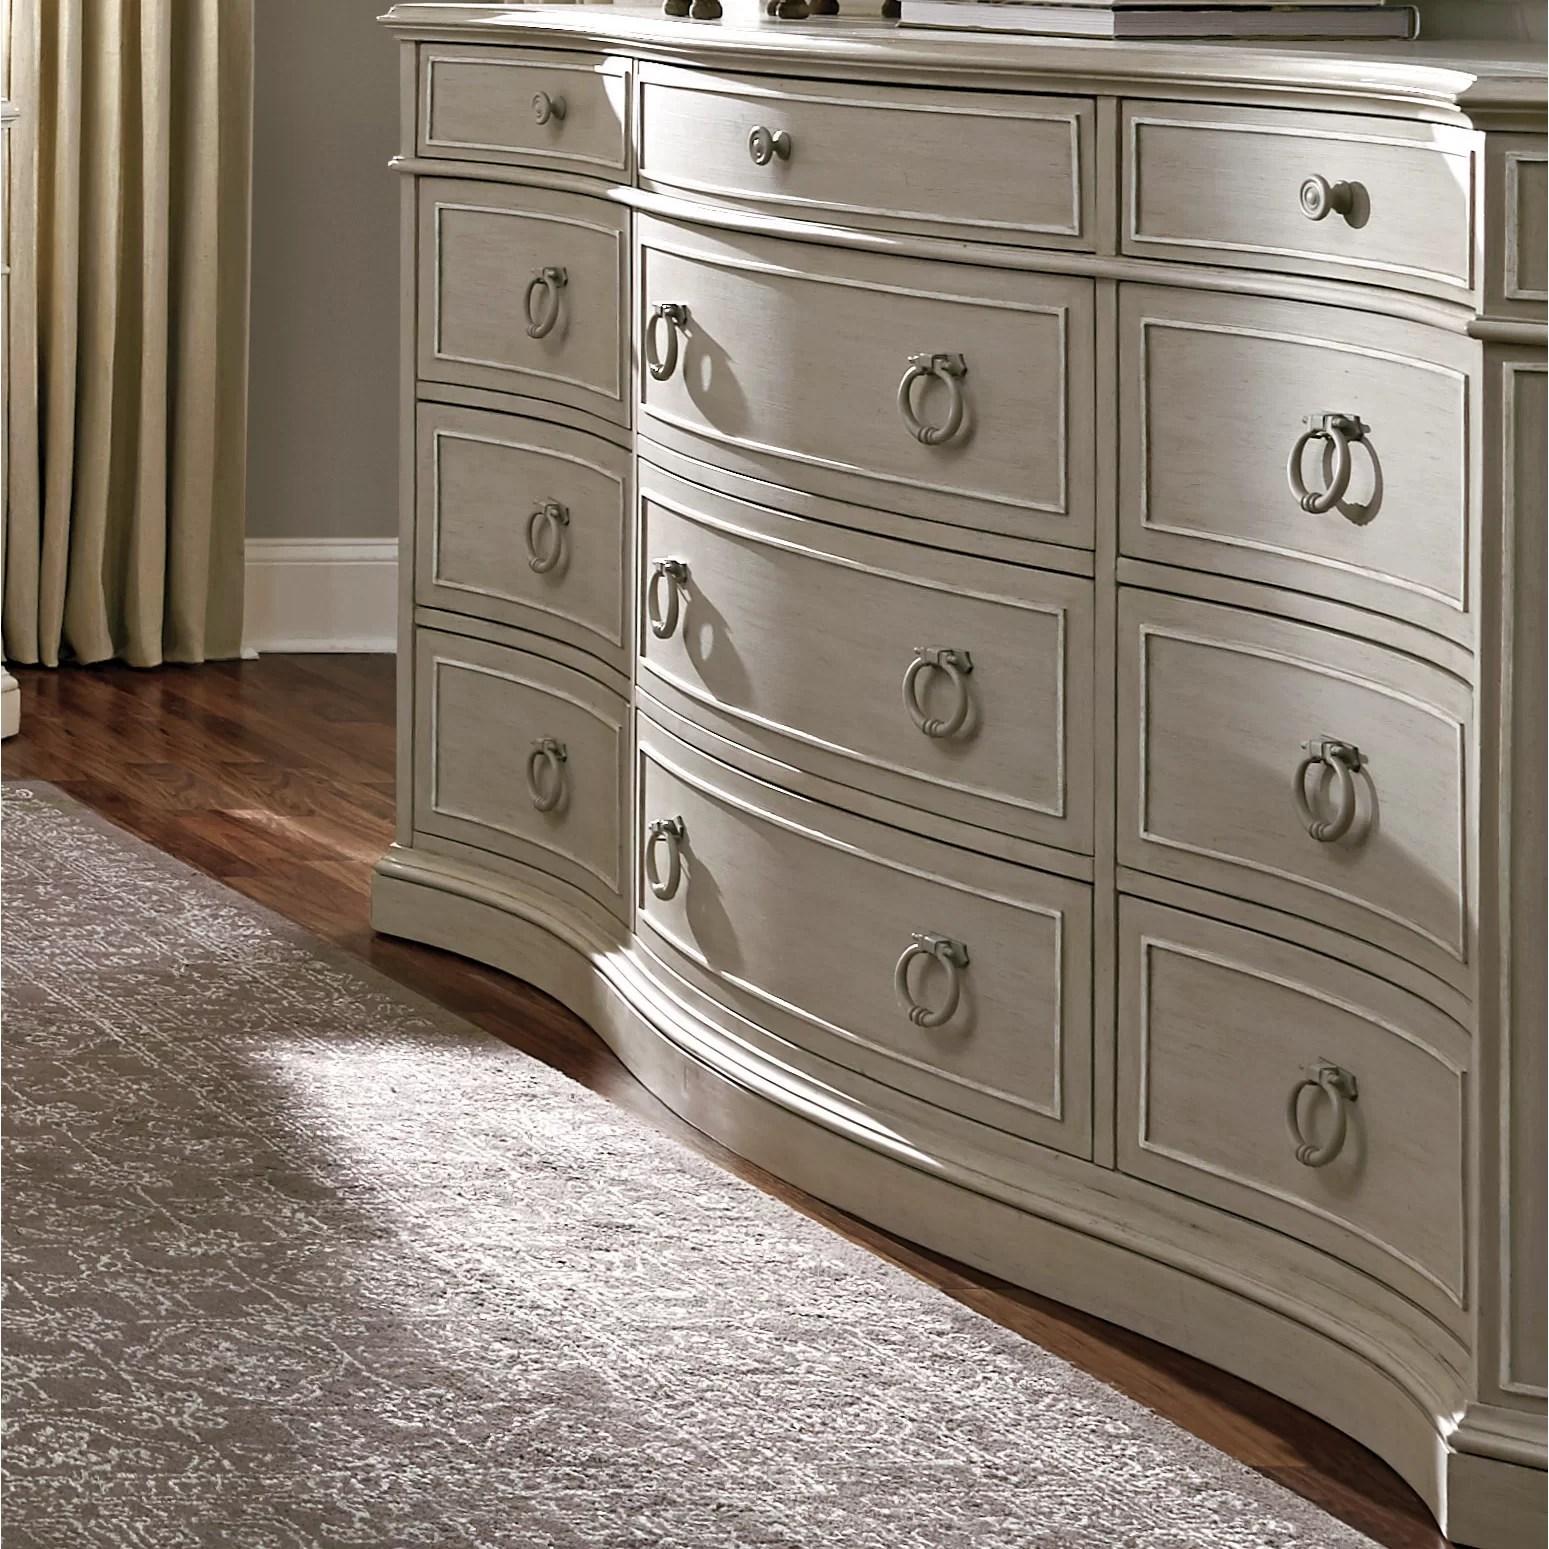 ART Chateaux 12 Drawer Dresser  Reviews  Wayfair